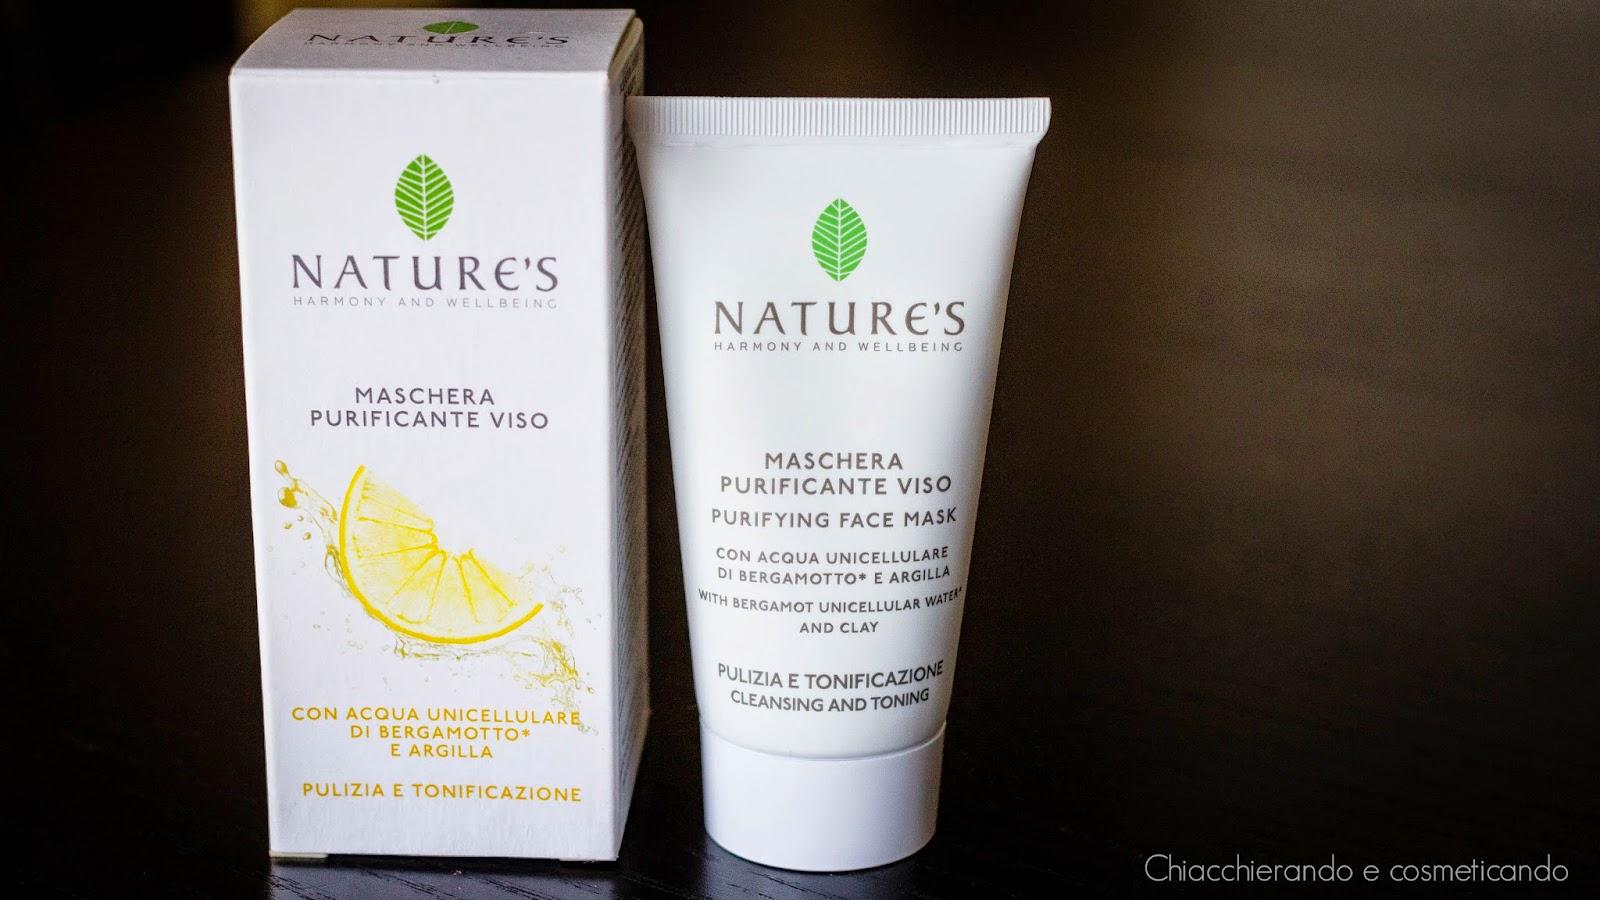 Maschera purificante viso - Nature's